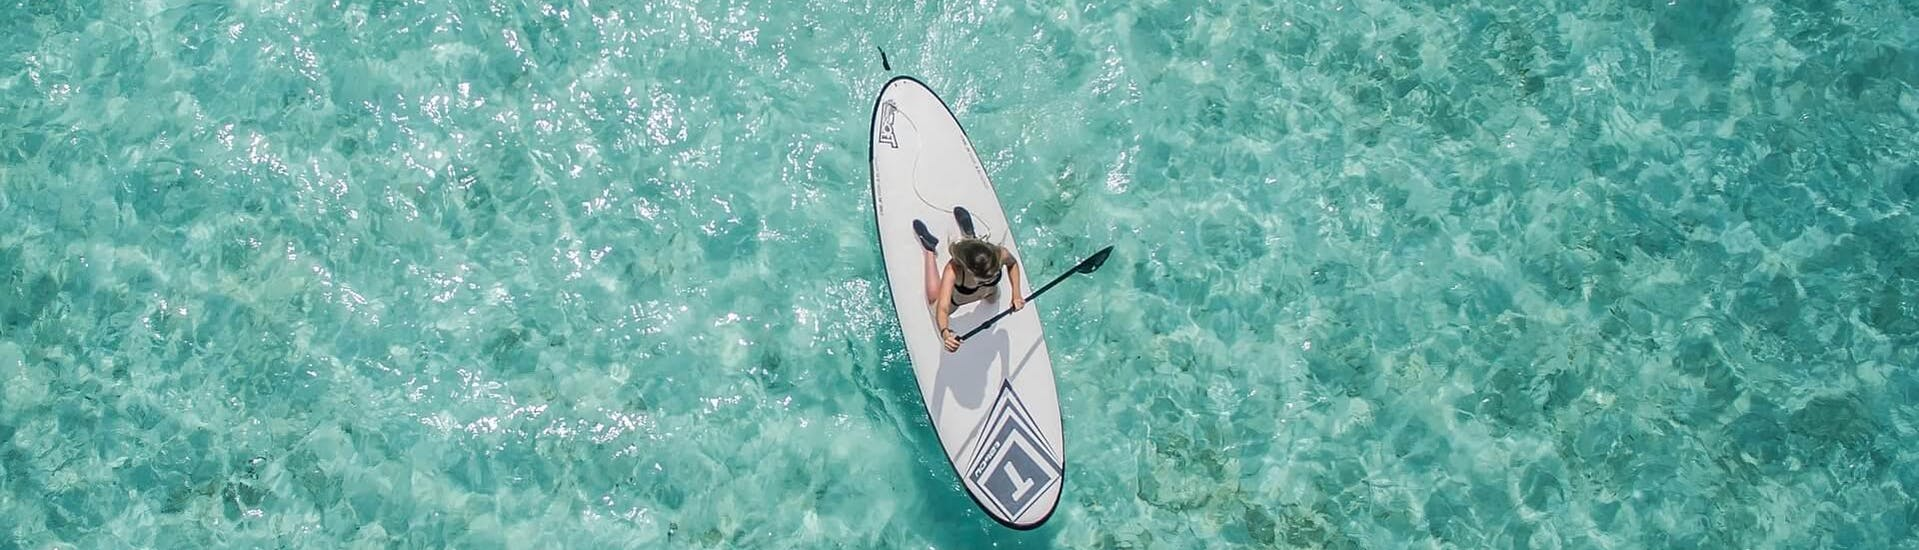 stand-up-paddle-board-rental-ibiza-take-off-ibiza-hero